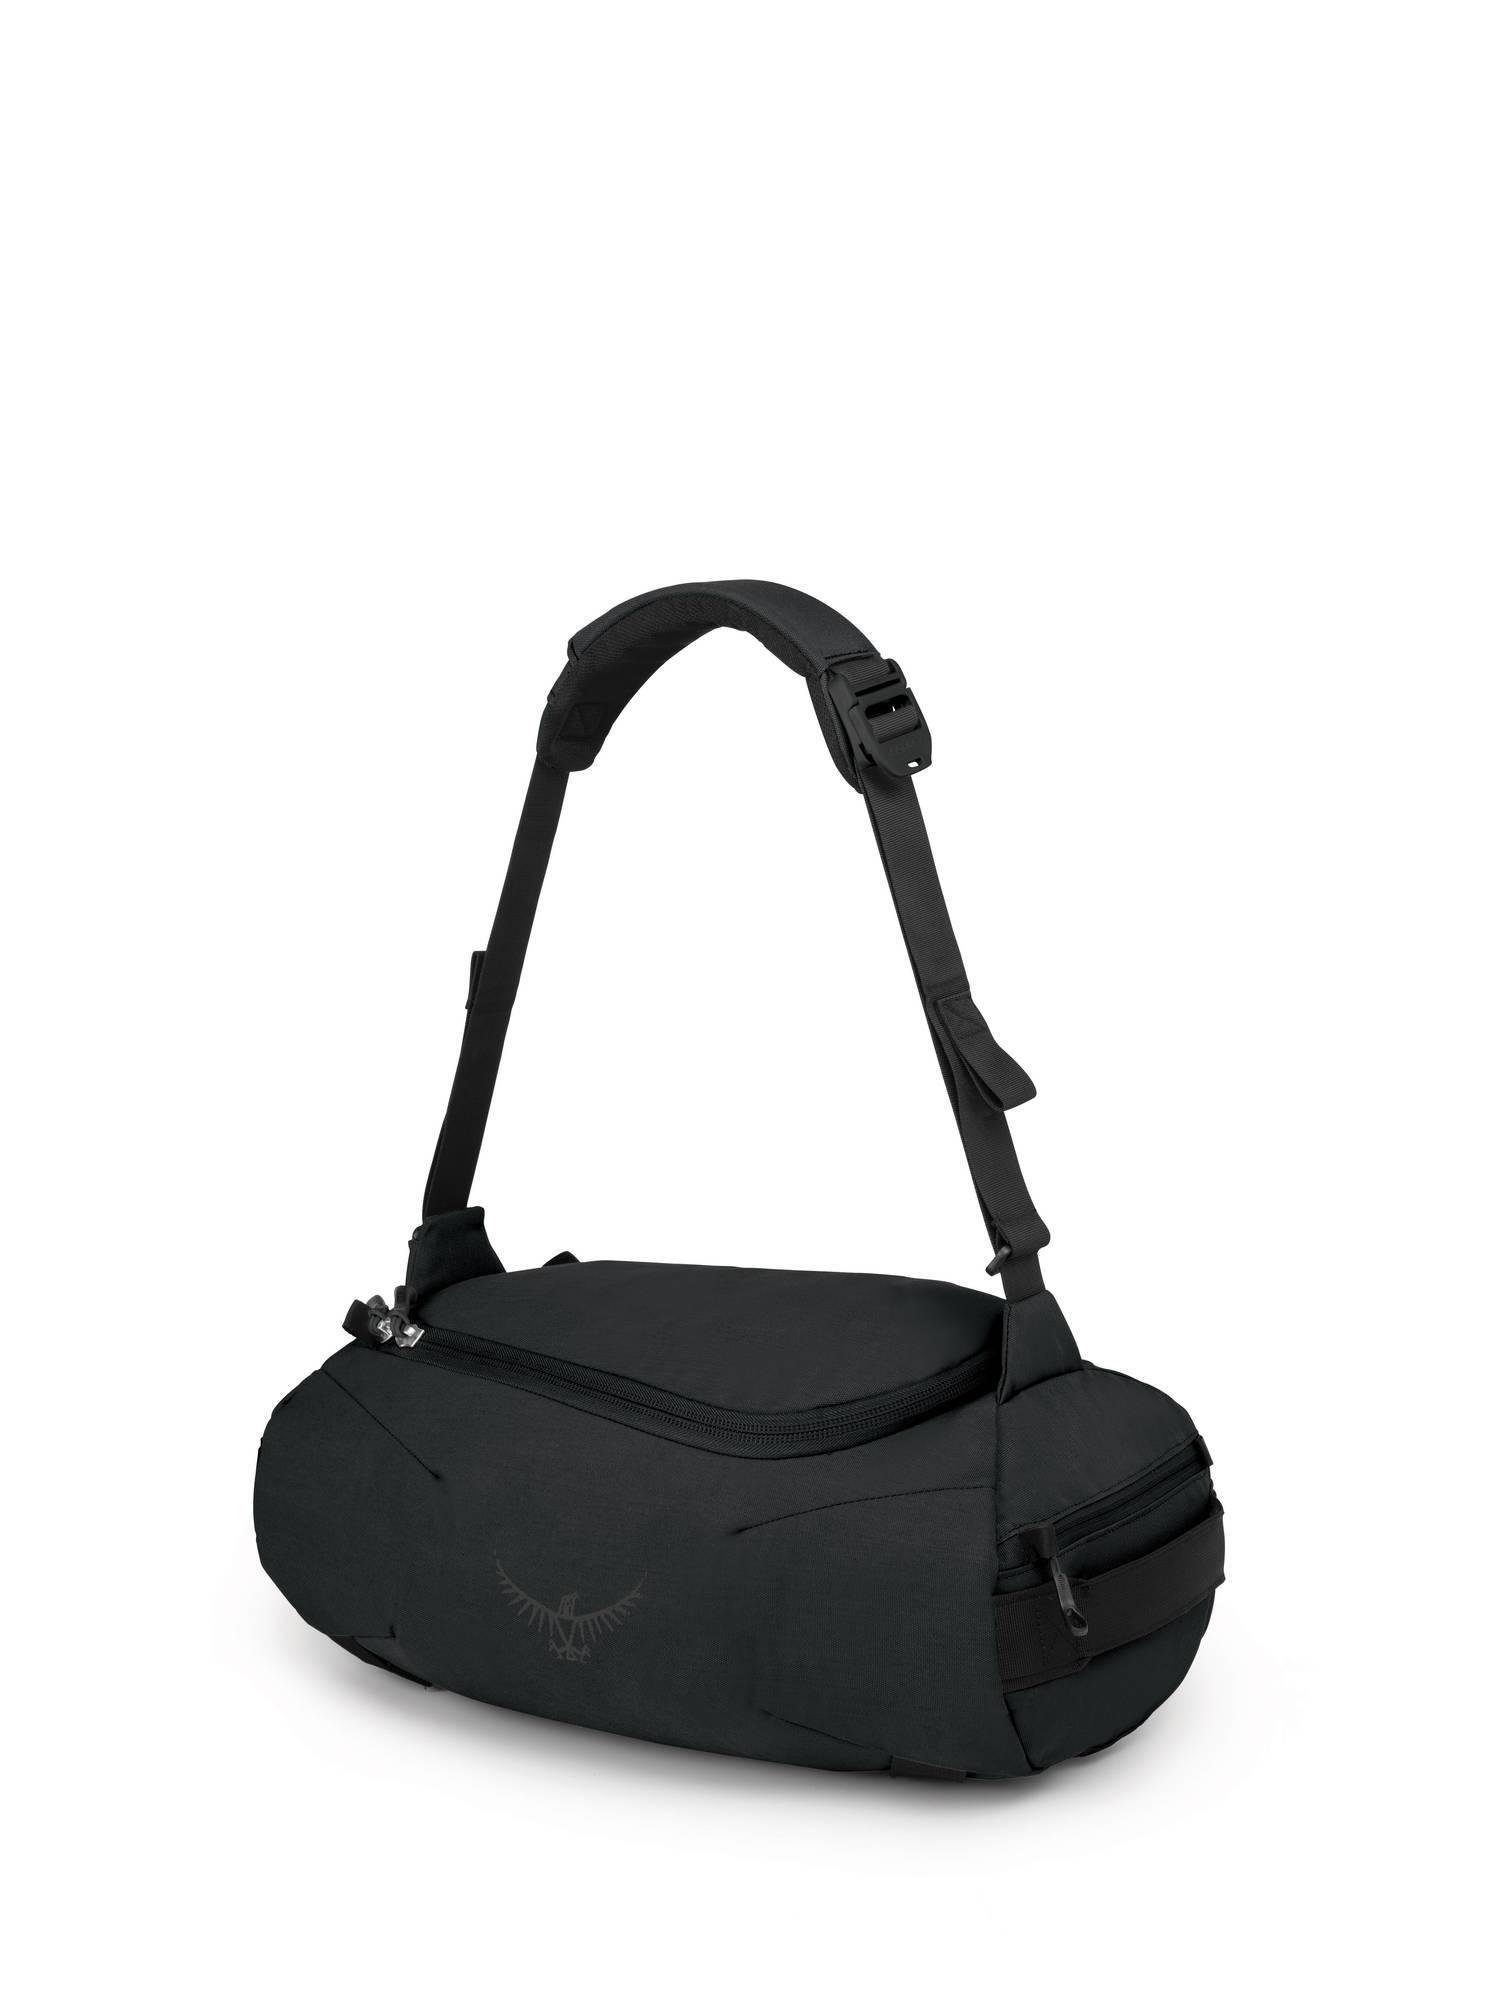 Сумки-рюкзаки Сумка Osprey Trillium 30 Duffel Black Trillium_30_F17_Side_Black_web.jpg